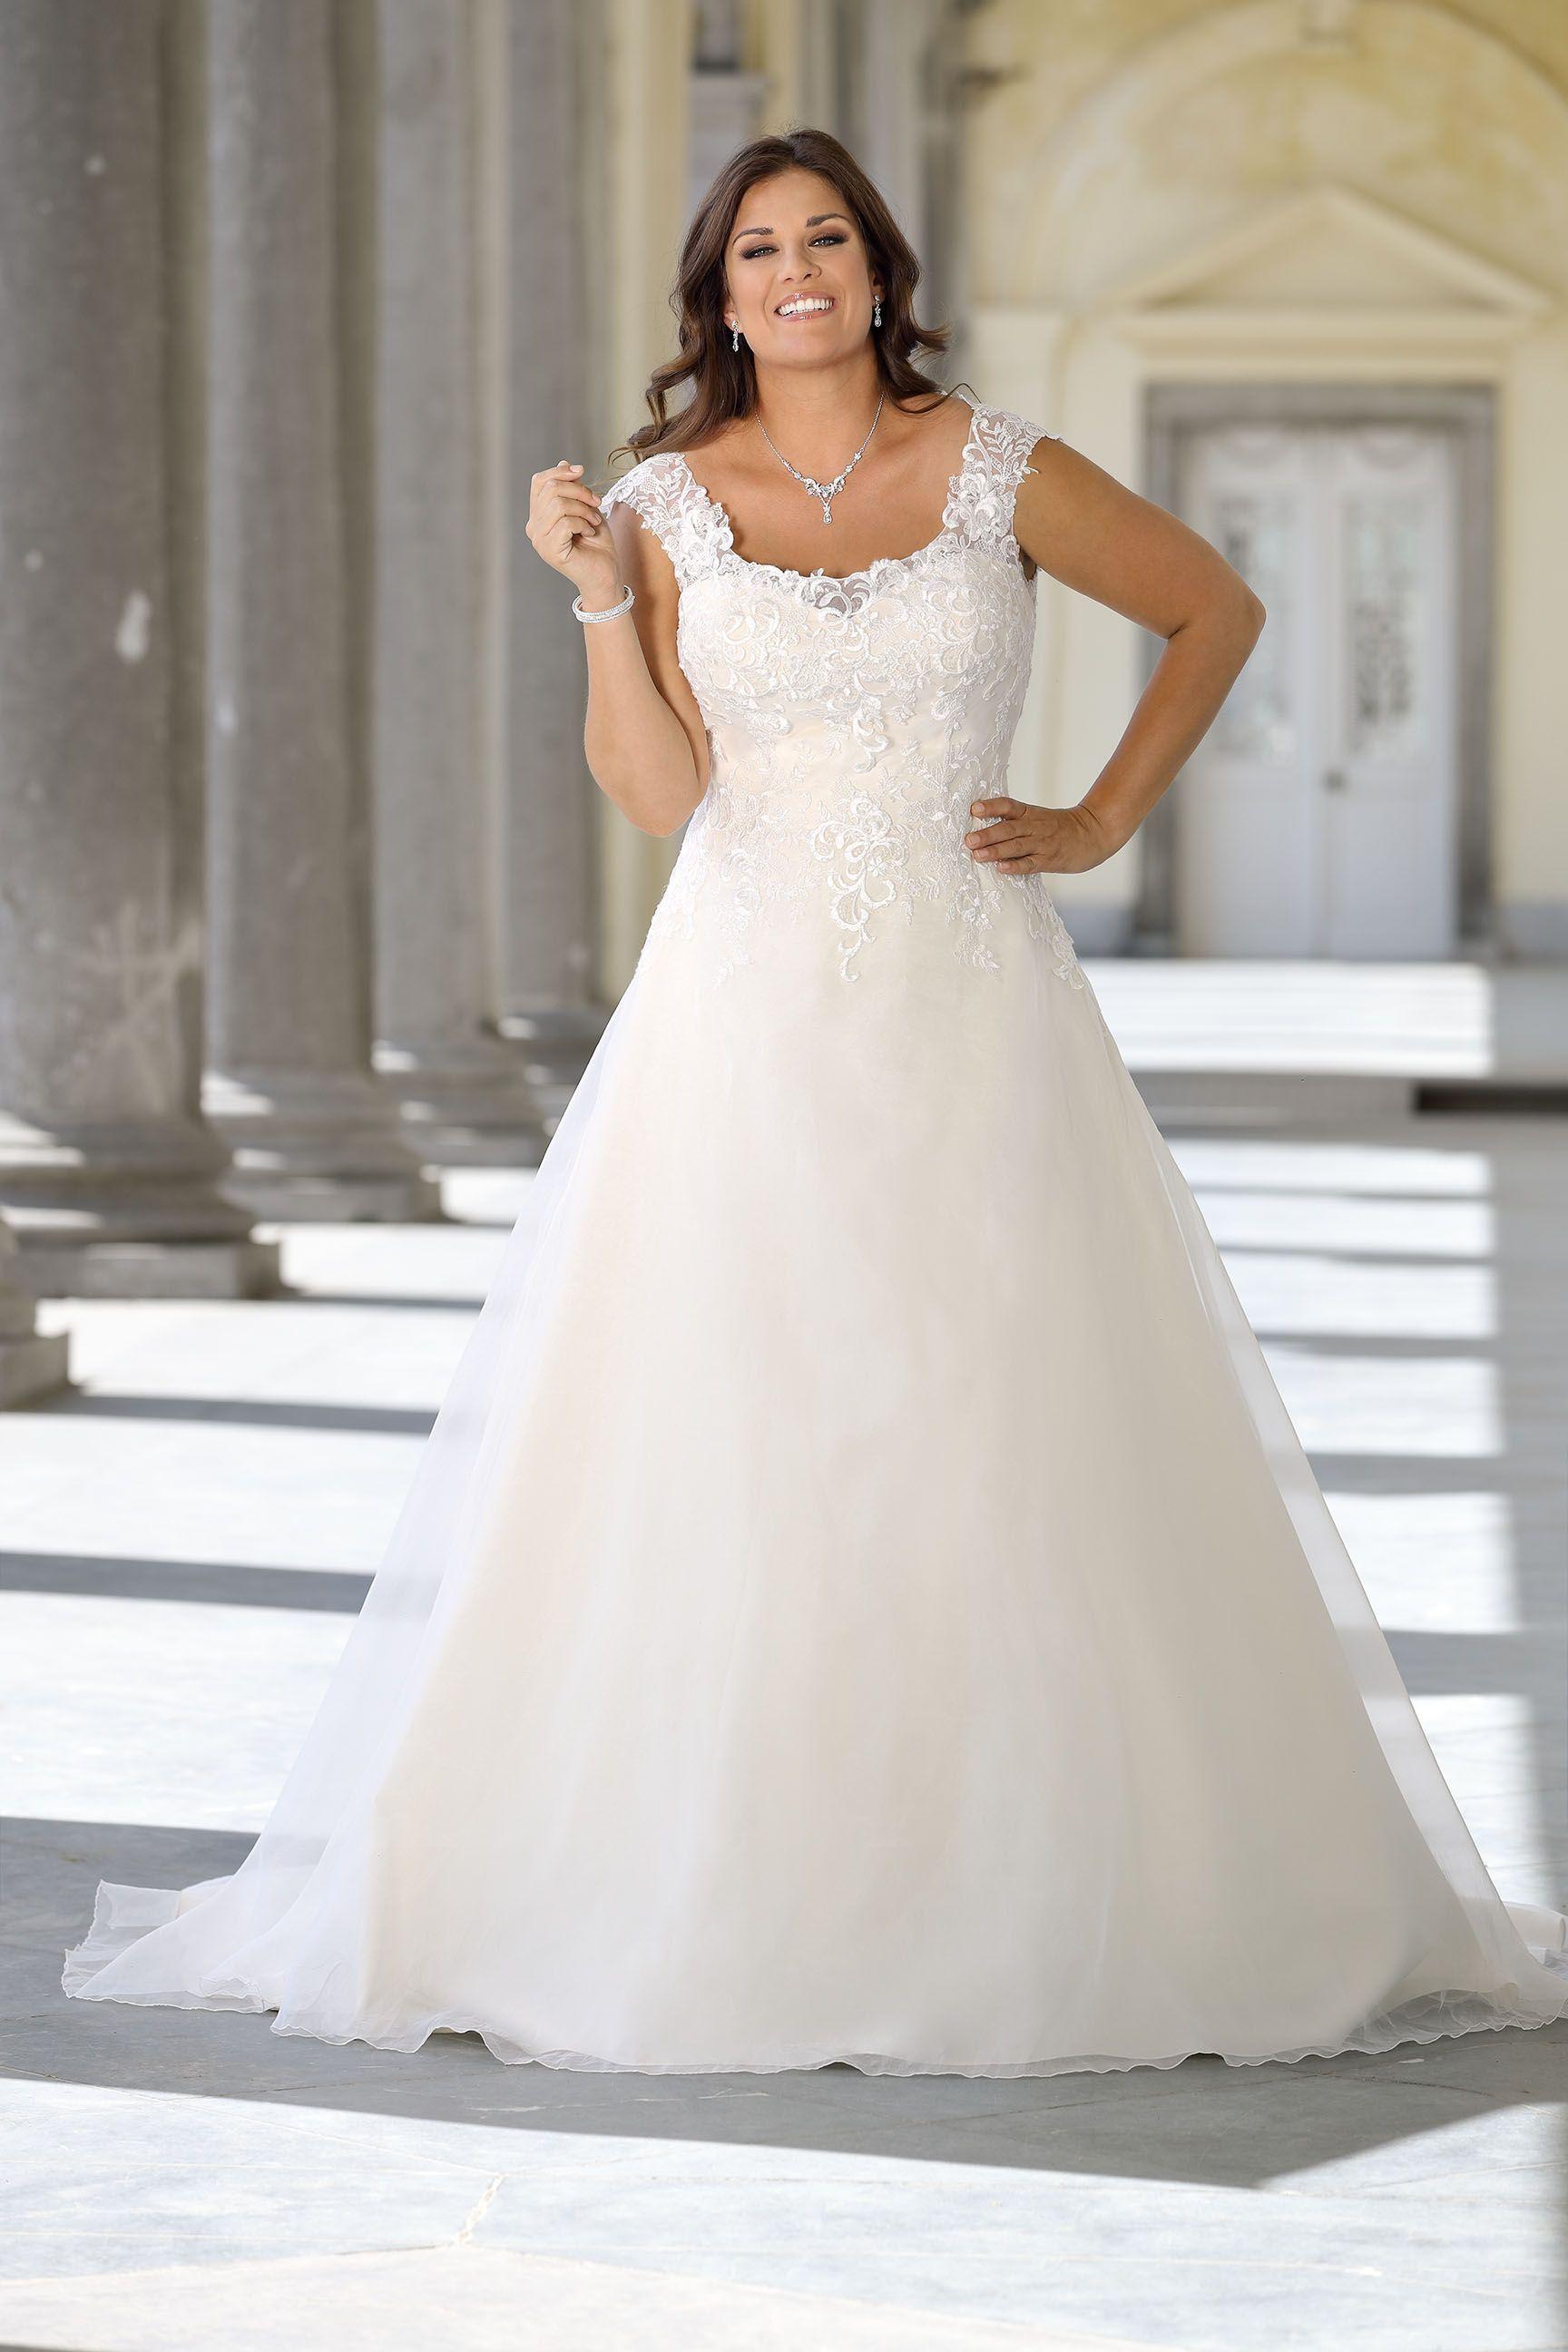 Ladybird Plus Size Plus Size Wedding Dresses By Ladybird Bridal Looking Fo Dream Wedding Dresses Plus Size Wedding Dresses With Sleeves Plus Size Wedding Gowns